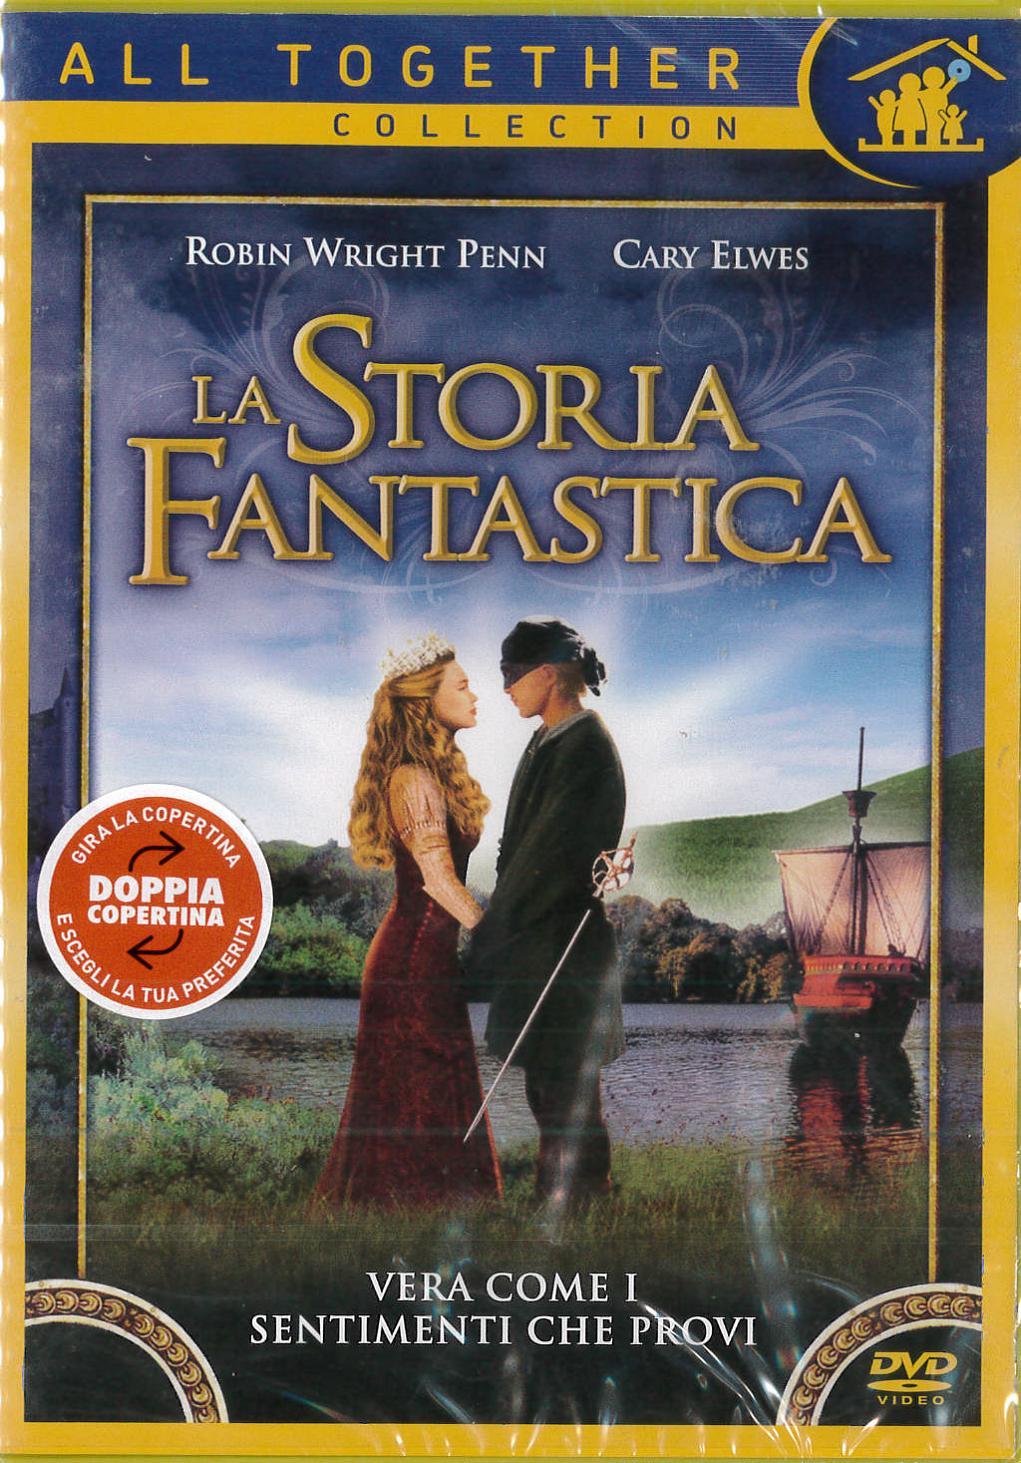 LA STORIA FANTASTICA (DVD)